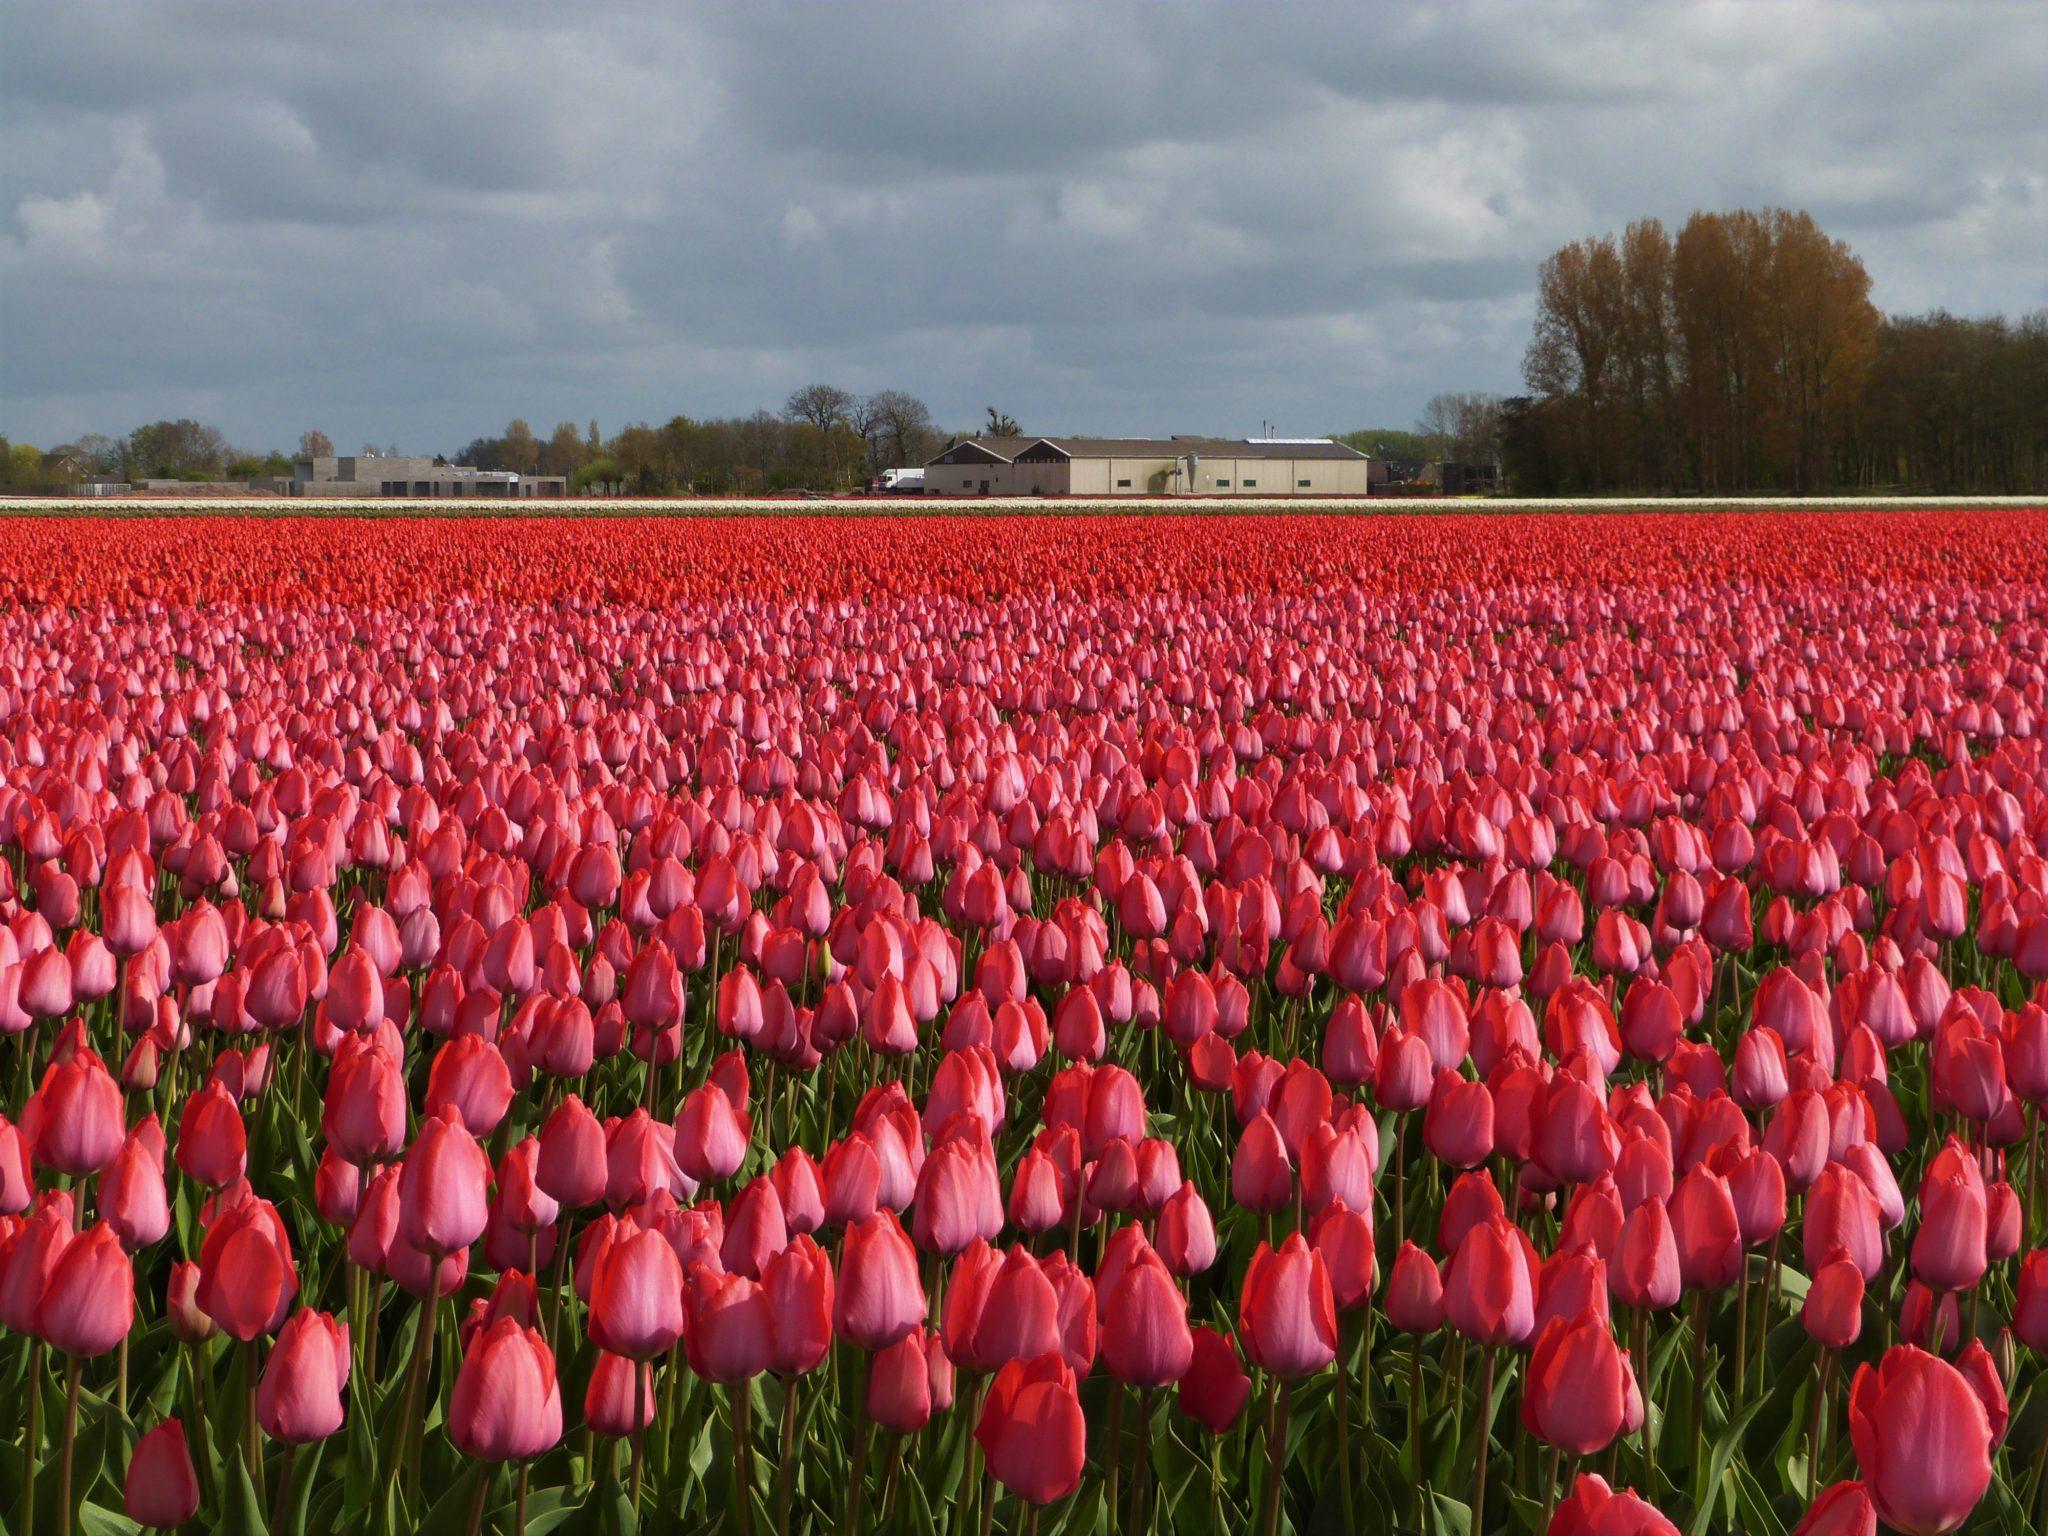 hubertine langemeijer roze tulpen in lisse